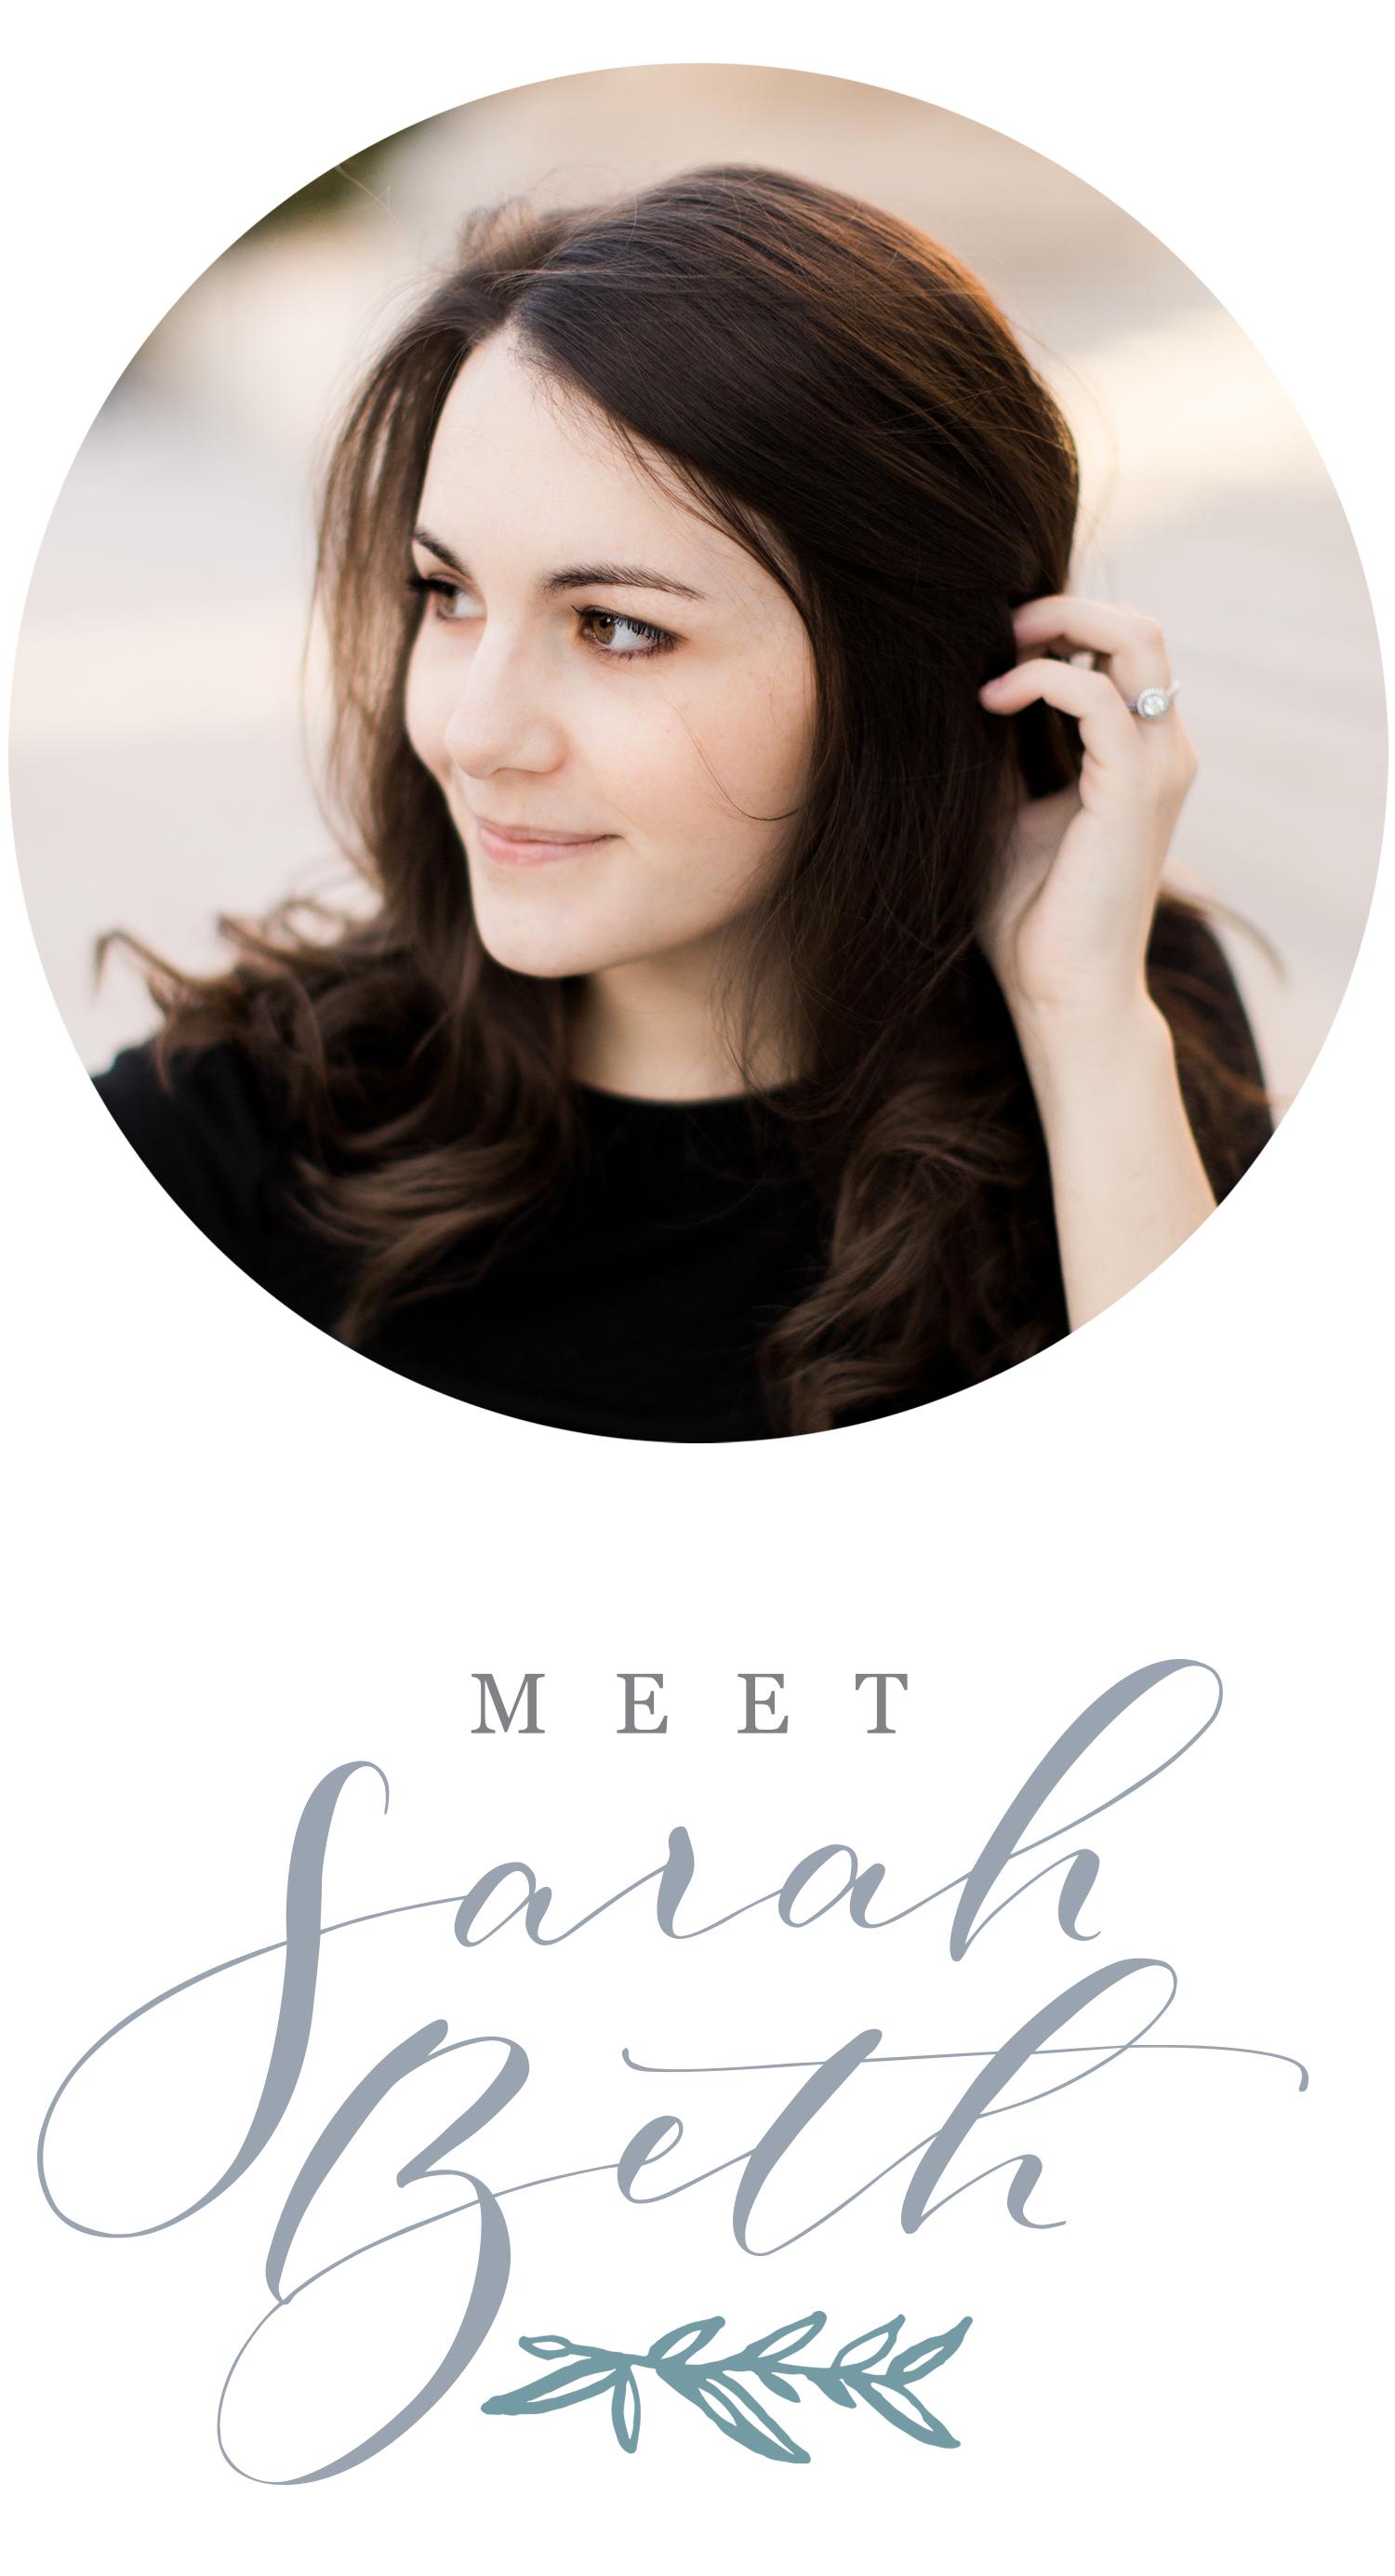 MeetSarahBeth.jpg